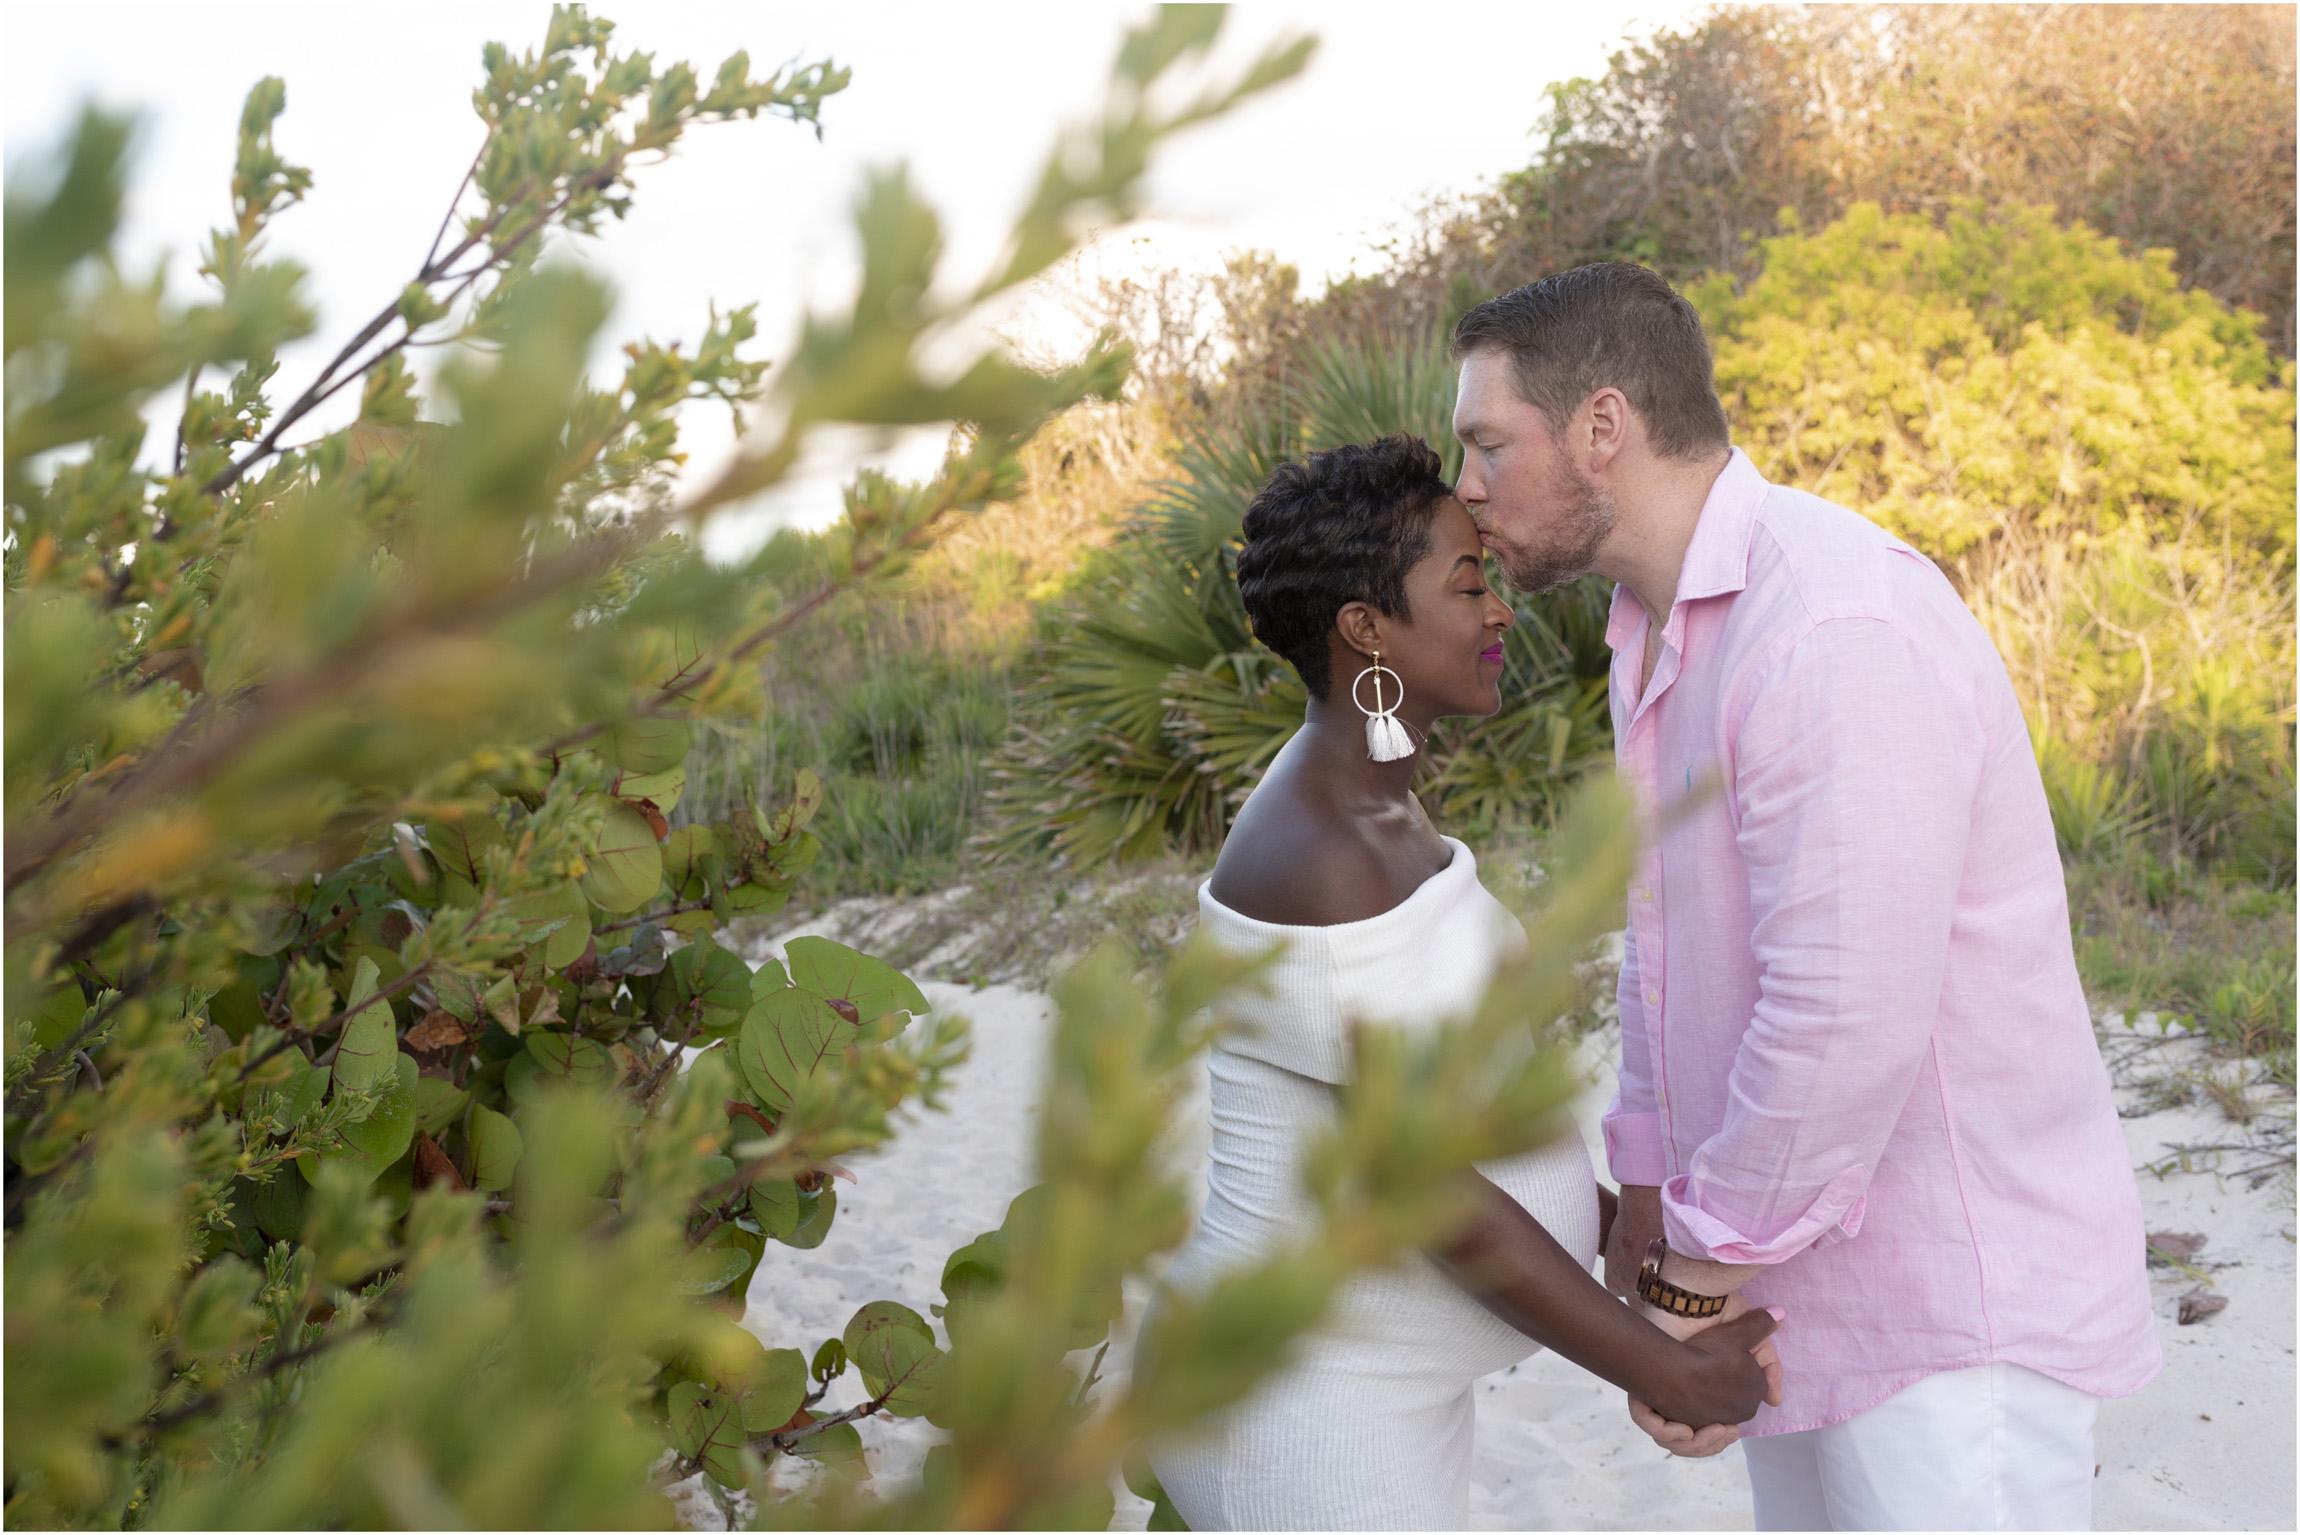 ©FianderFoto_Bermuda Maternity Photographer_Jennifer_Jonathan_032.jpg